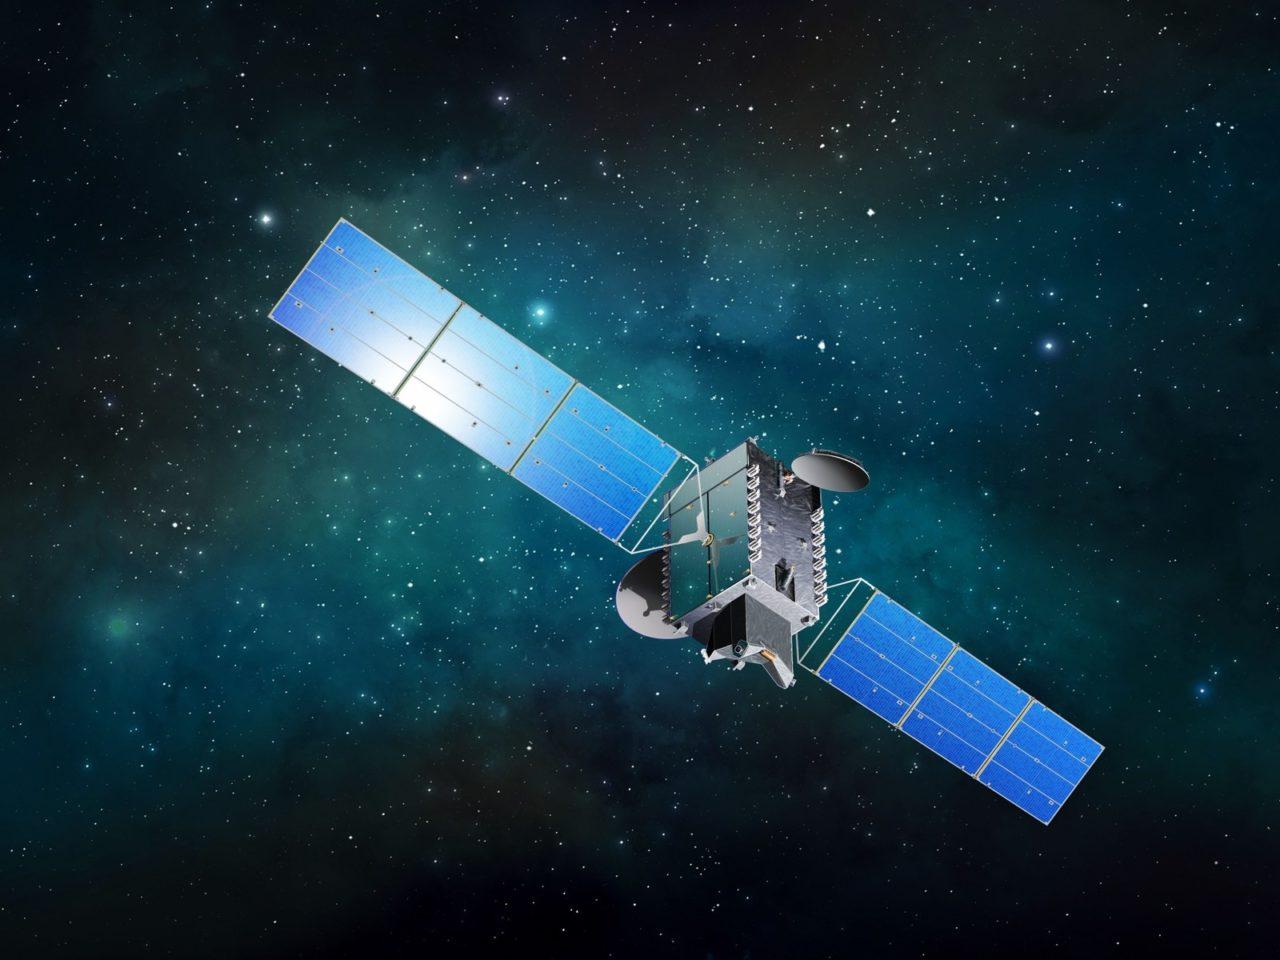 Rendition of the BSAT 4b satellite. Photo: SSL.